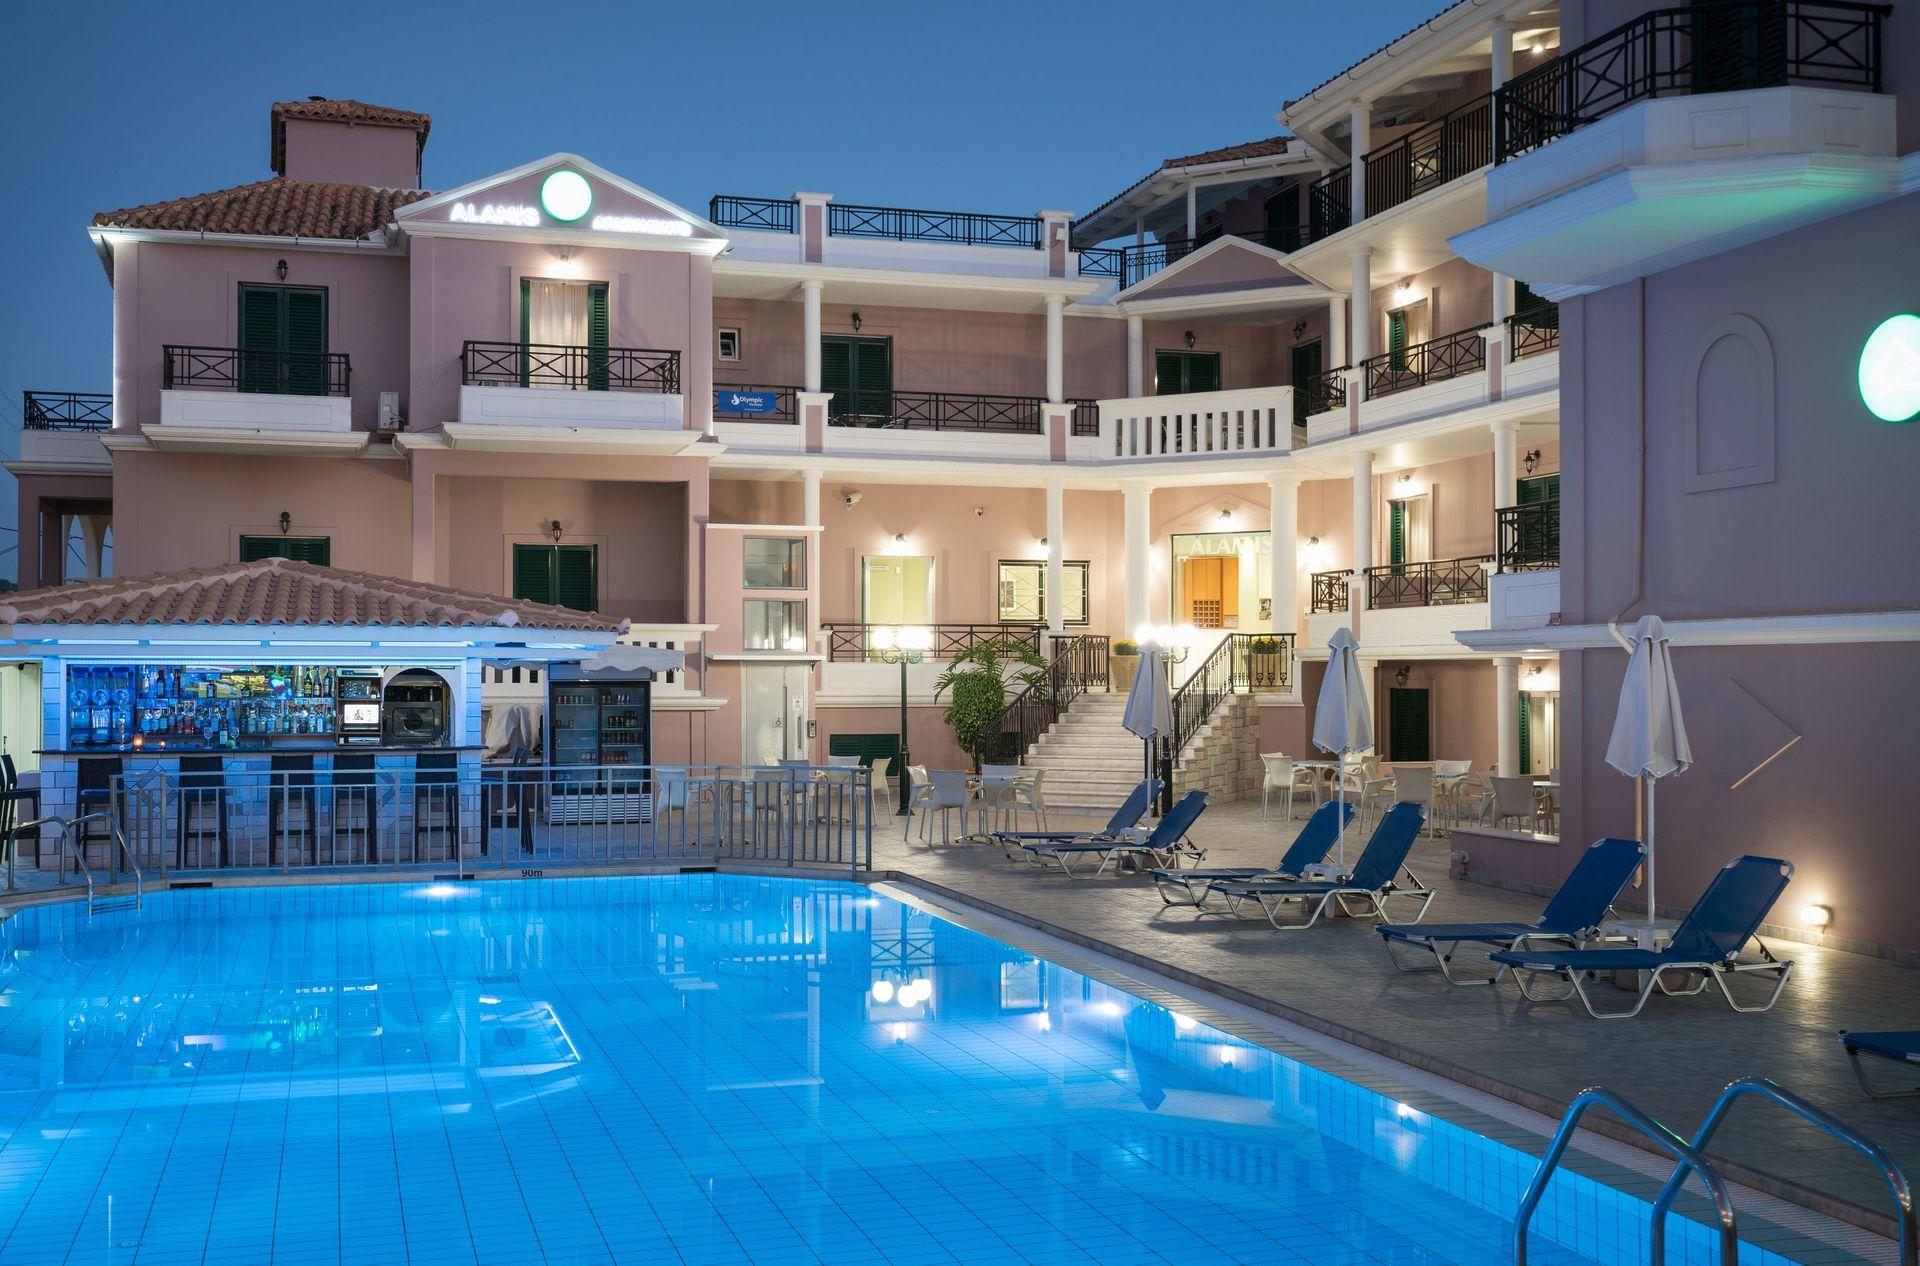 Alamis Apartments - Ζάκυνθος ✦ -25% ✦ 3 Ημέρες (2 Διανυκτερεύσεις)